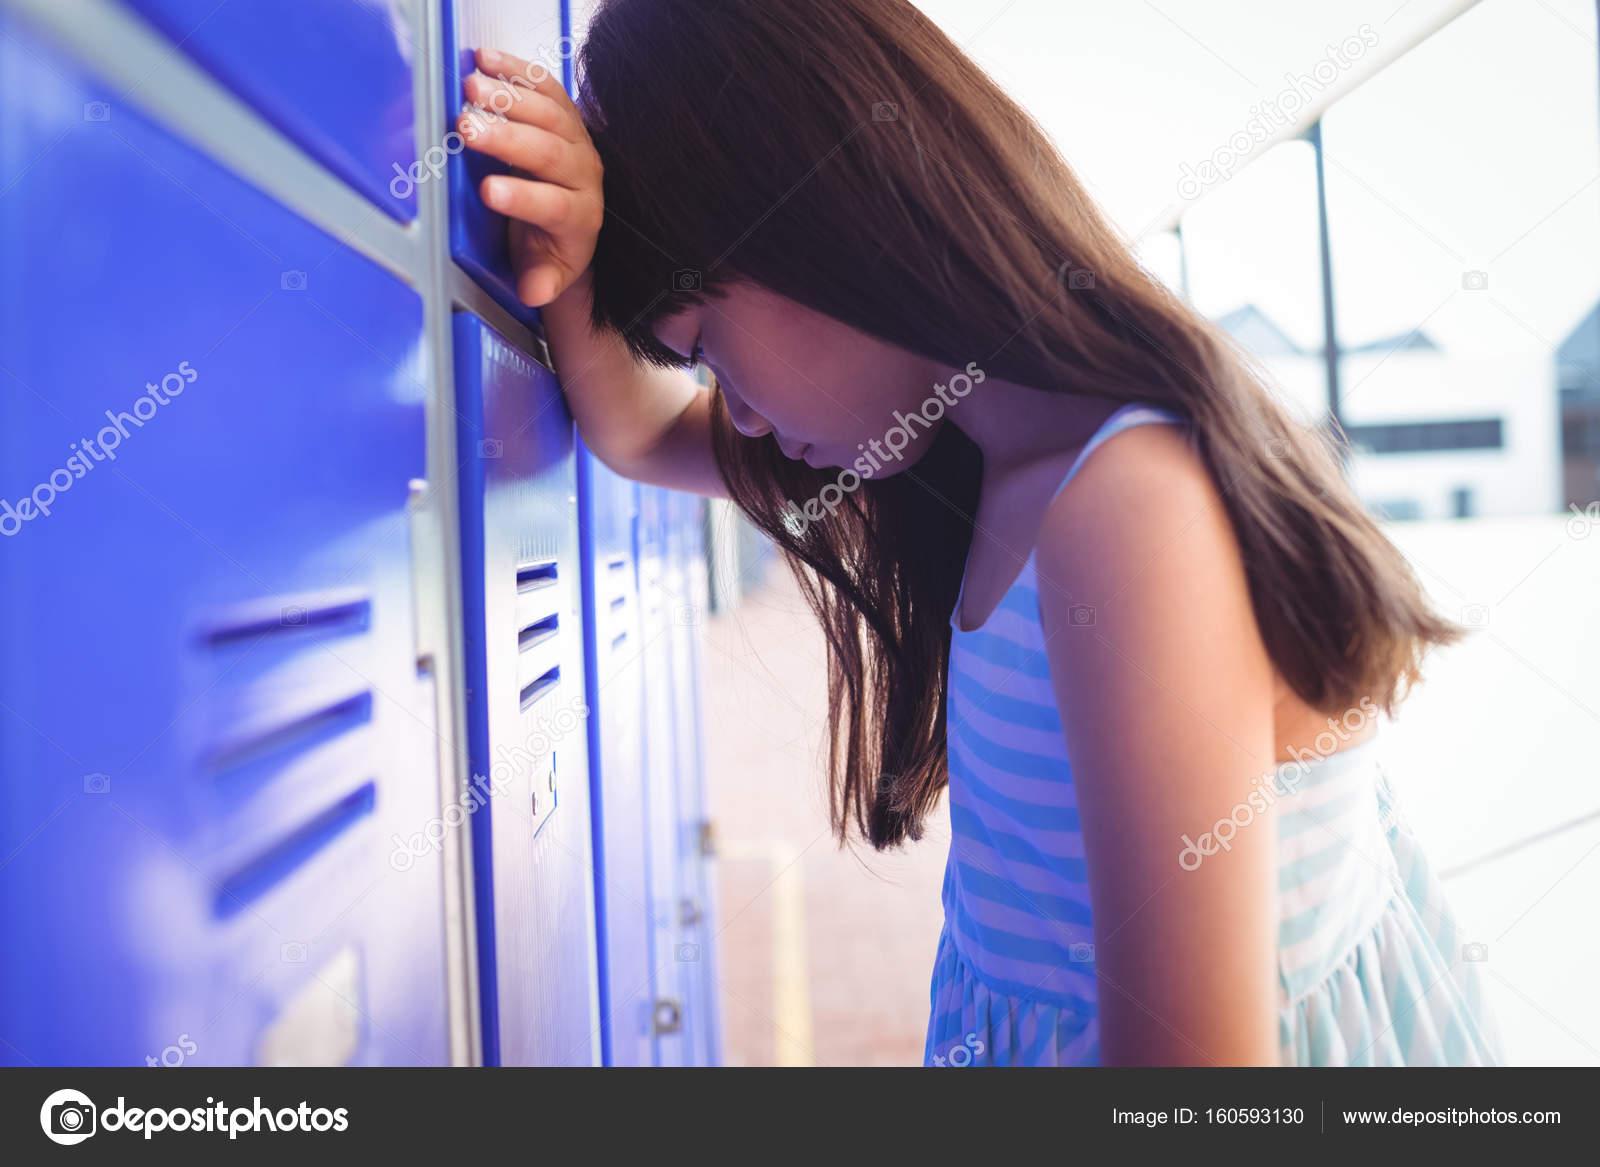 Sad girl leaning on lockers — Stock Photo